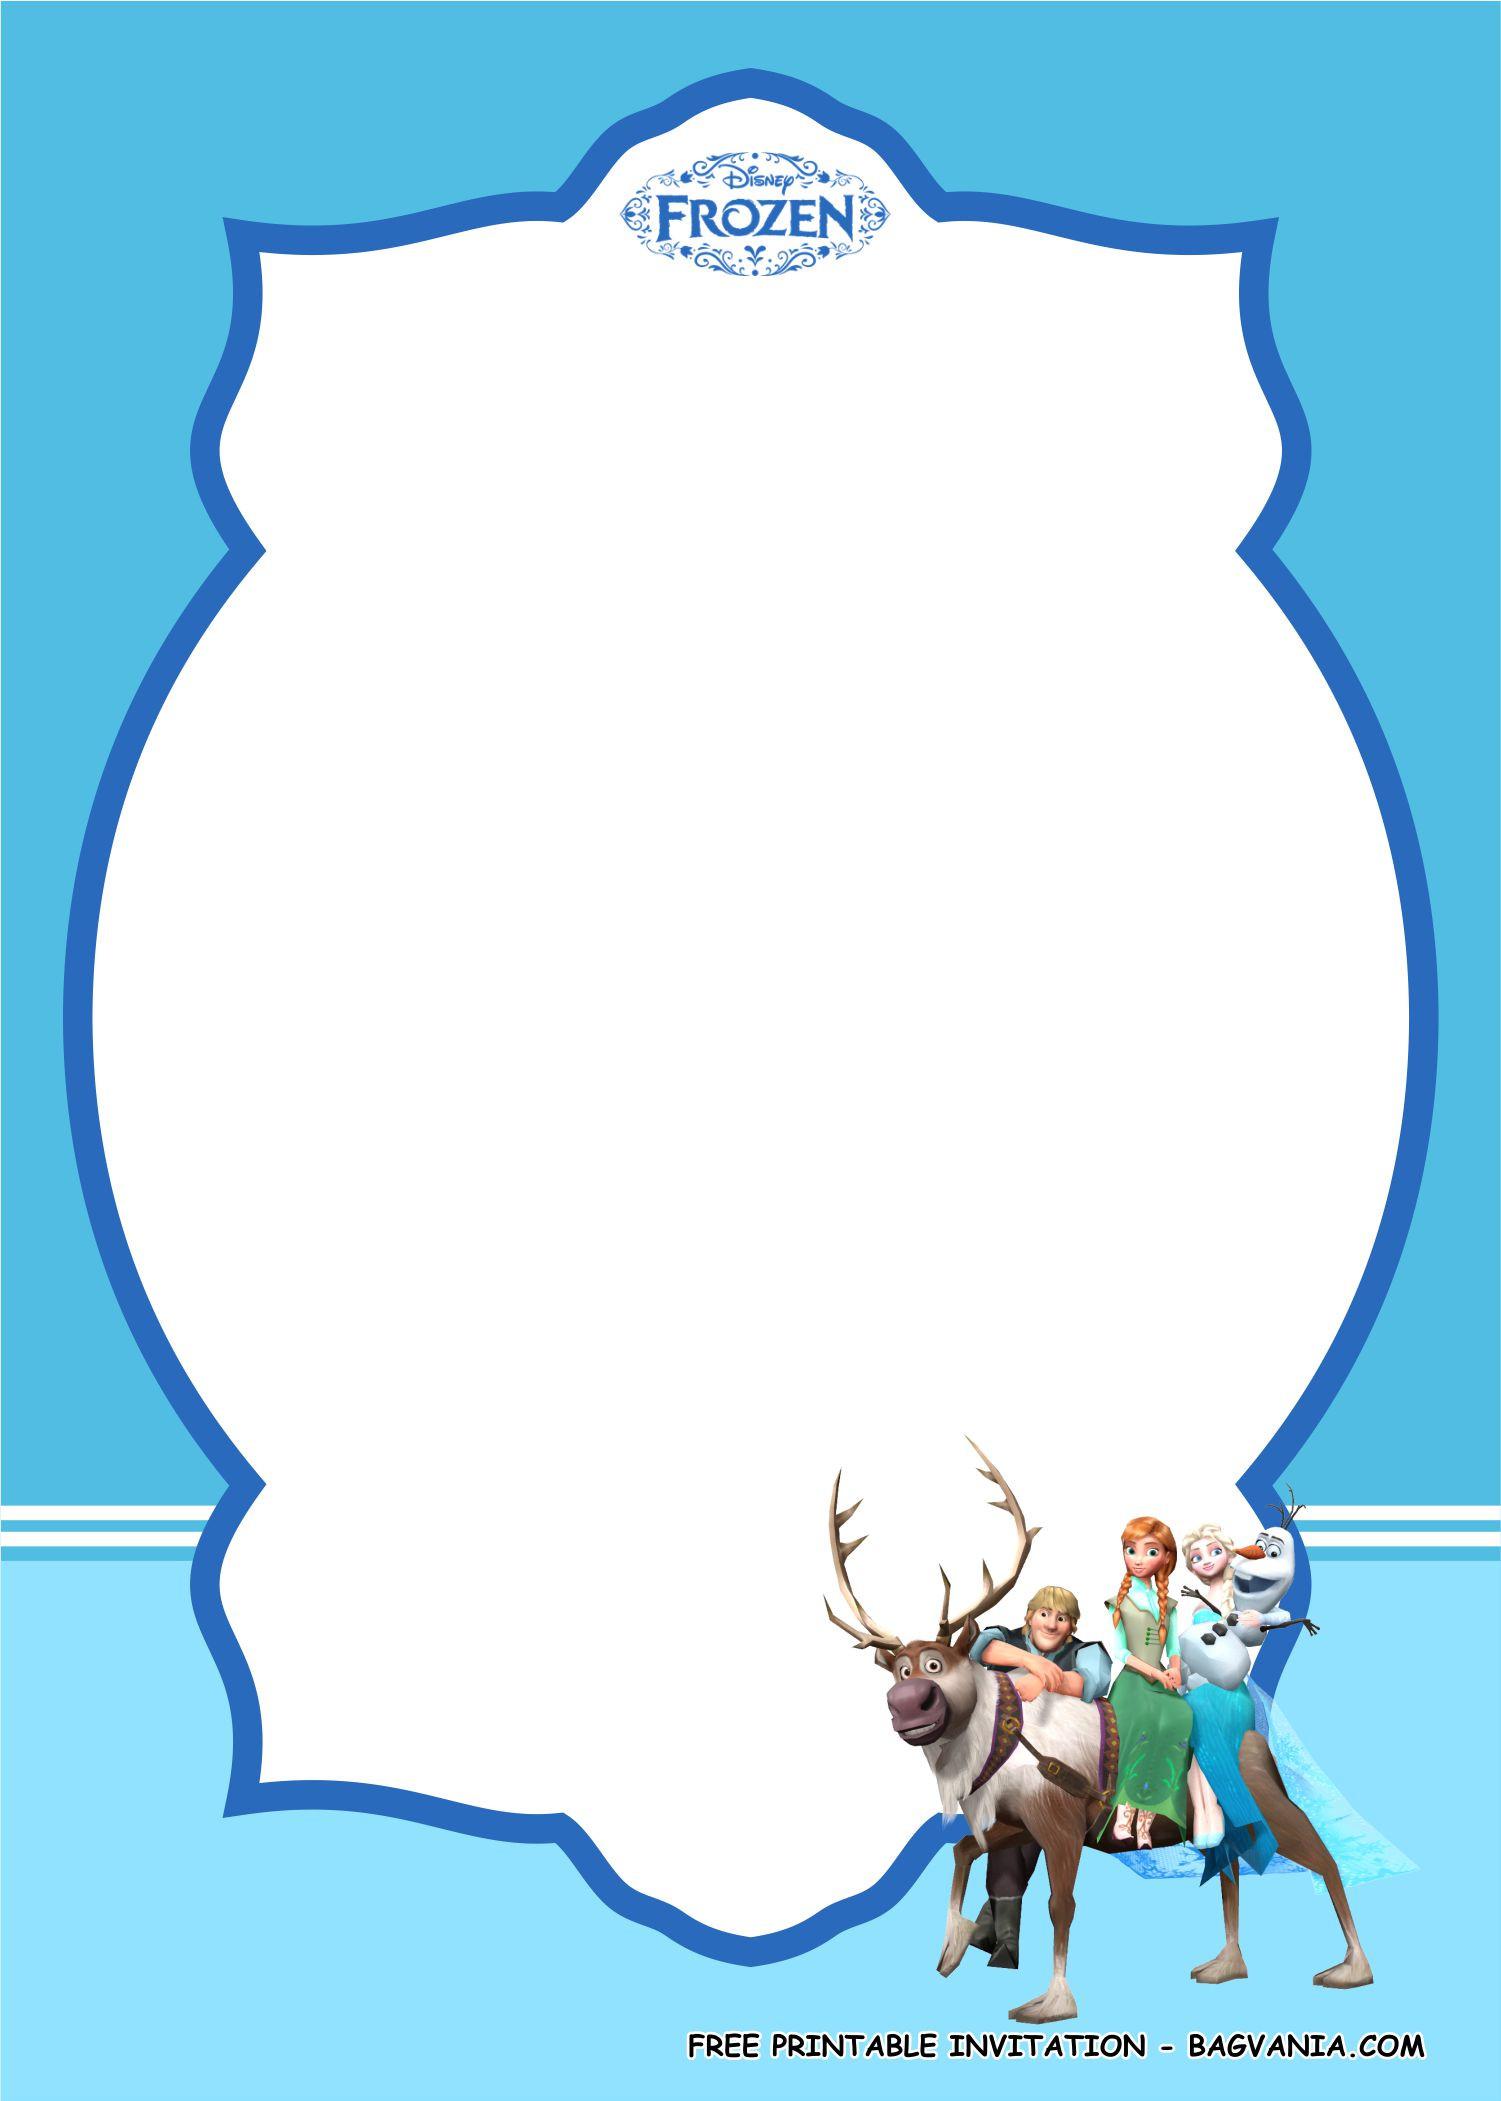 Frozen Invitations Printable Frozen Invitation Templates 1 – Free Printable Birthday